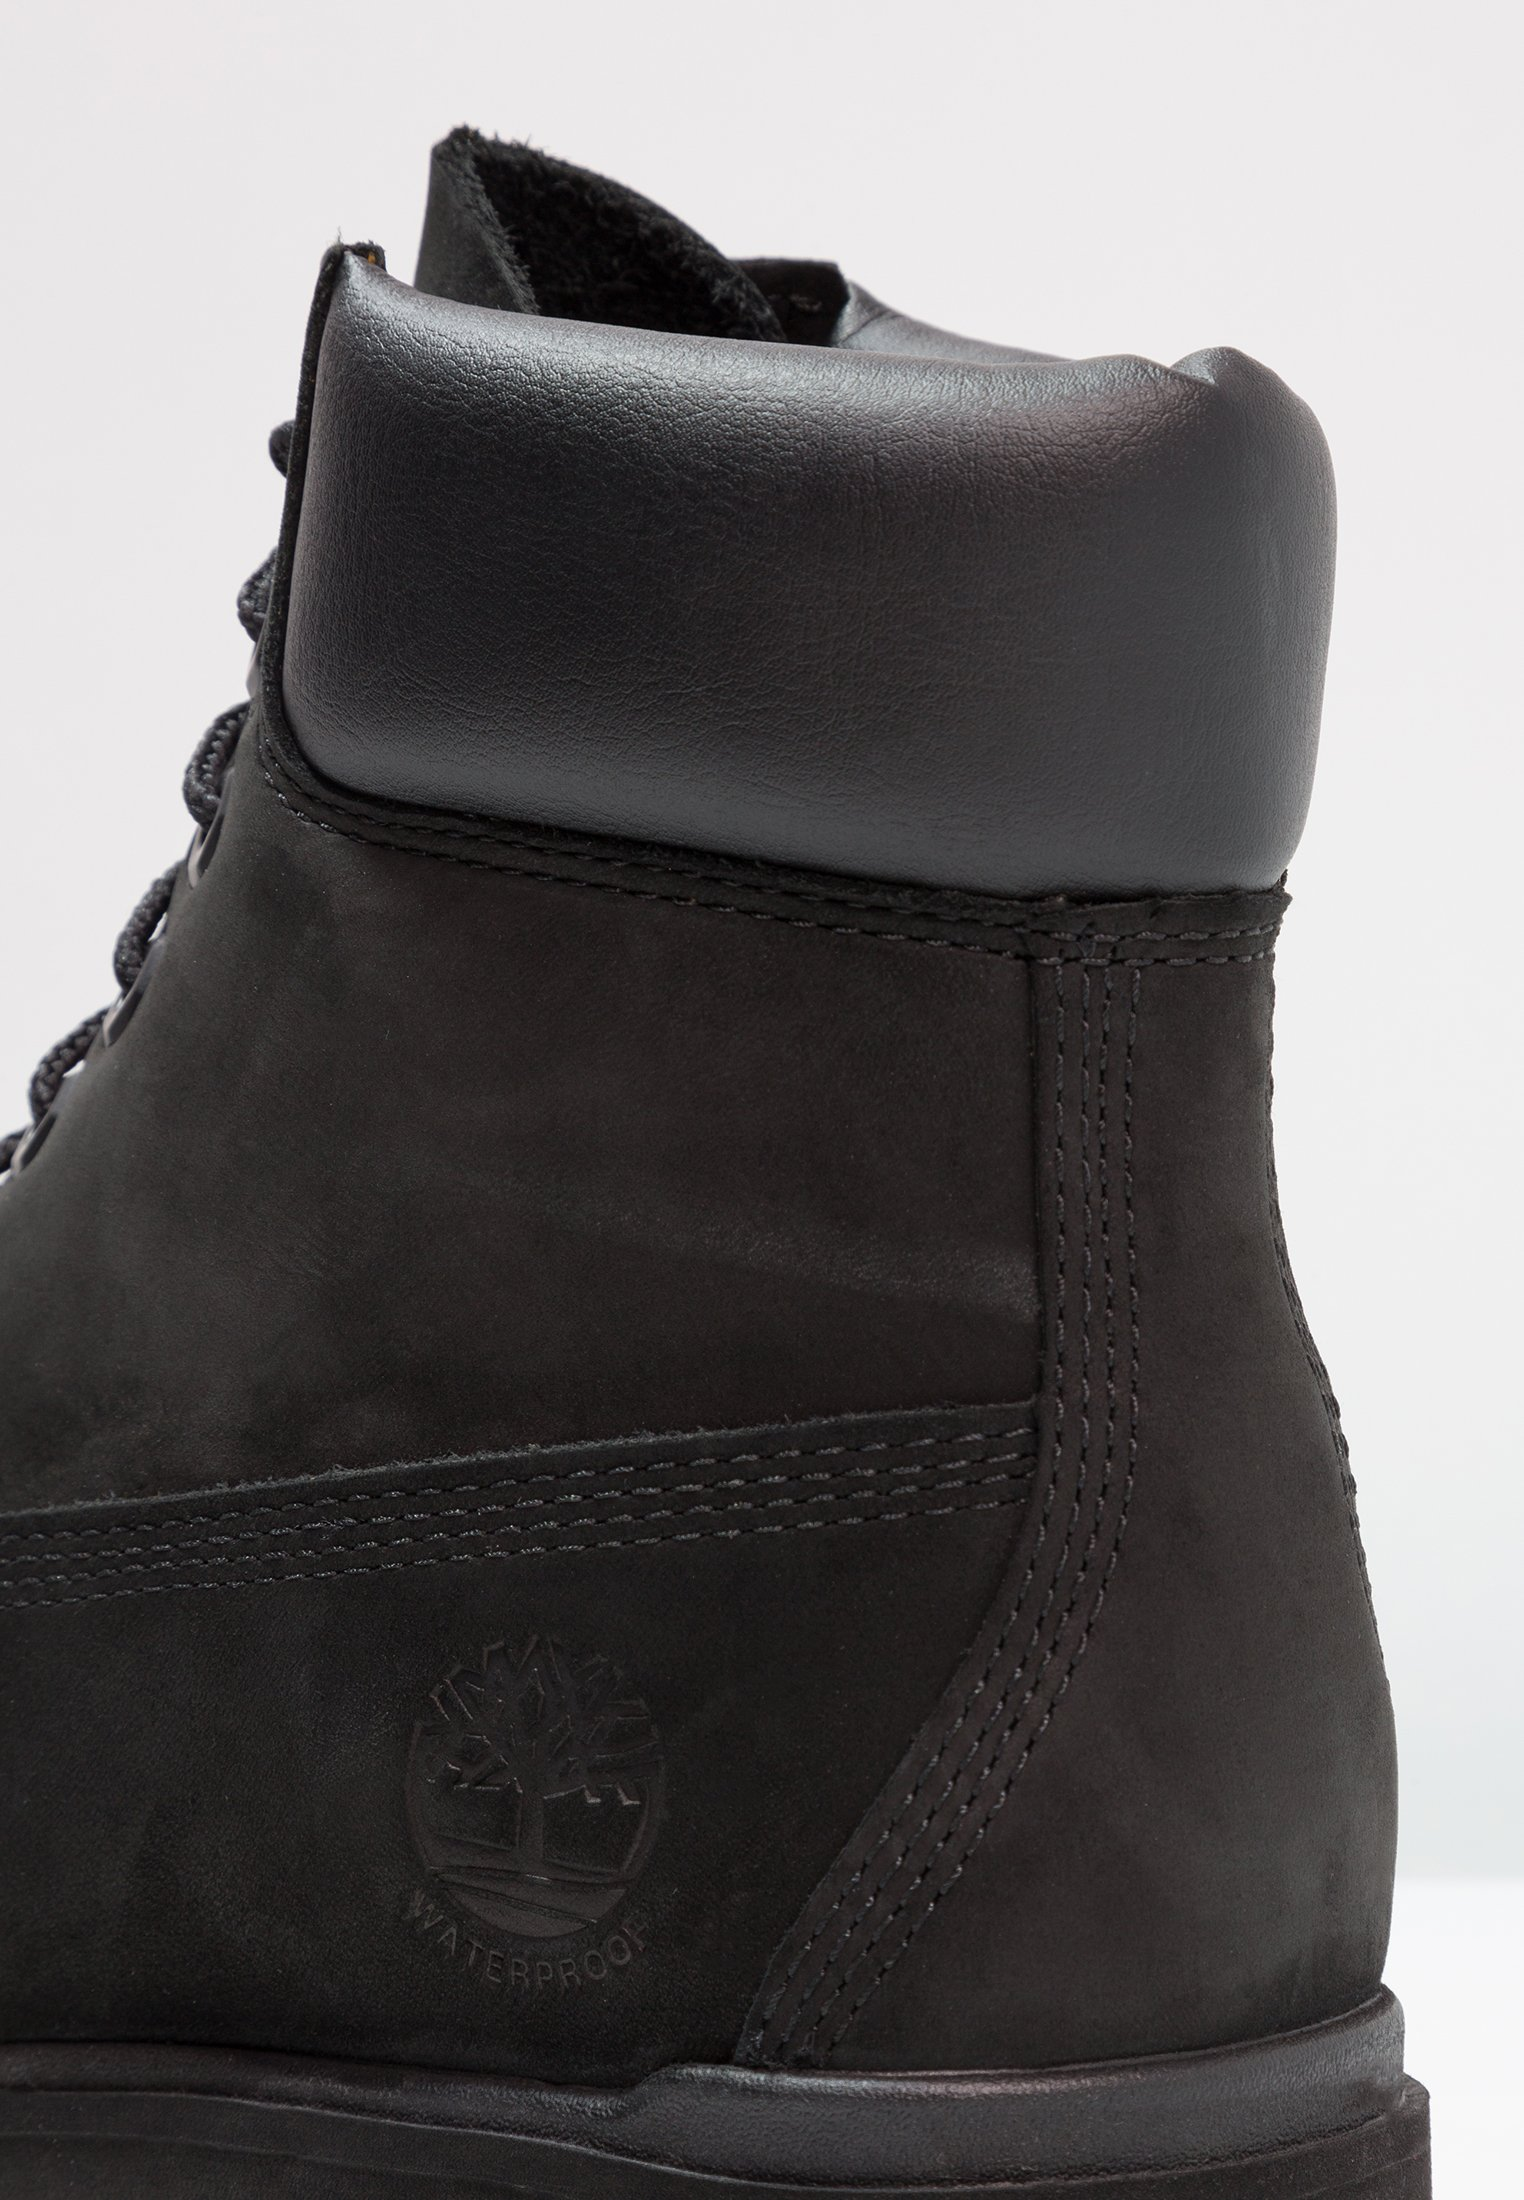 RADFORD 6 IN BOOT WP Stivaletti stringati black